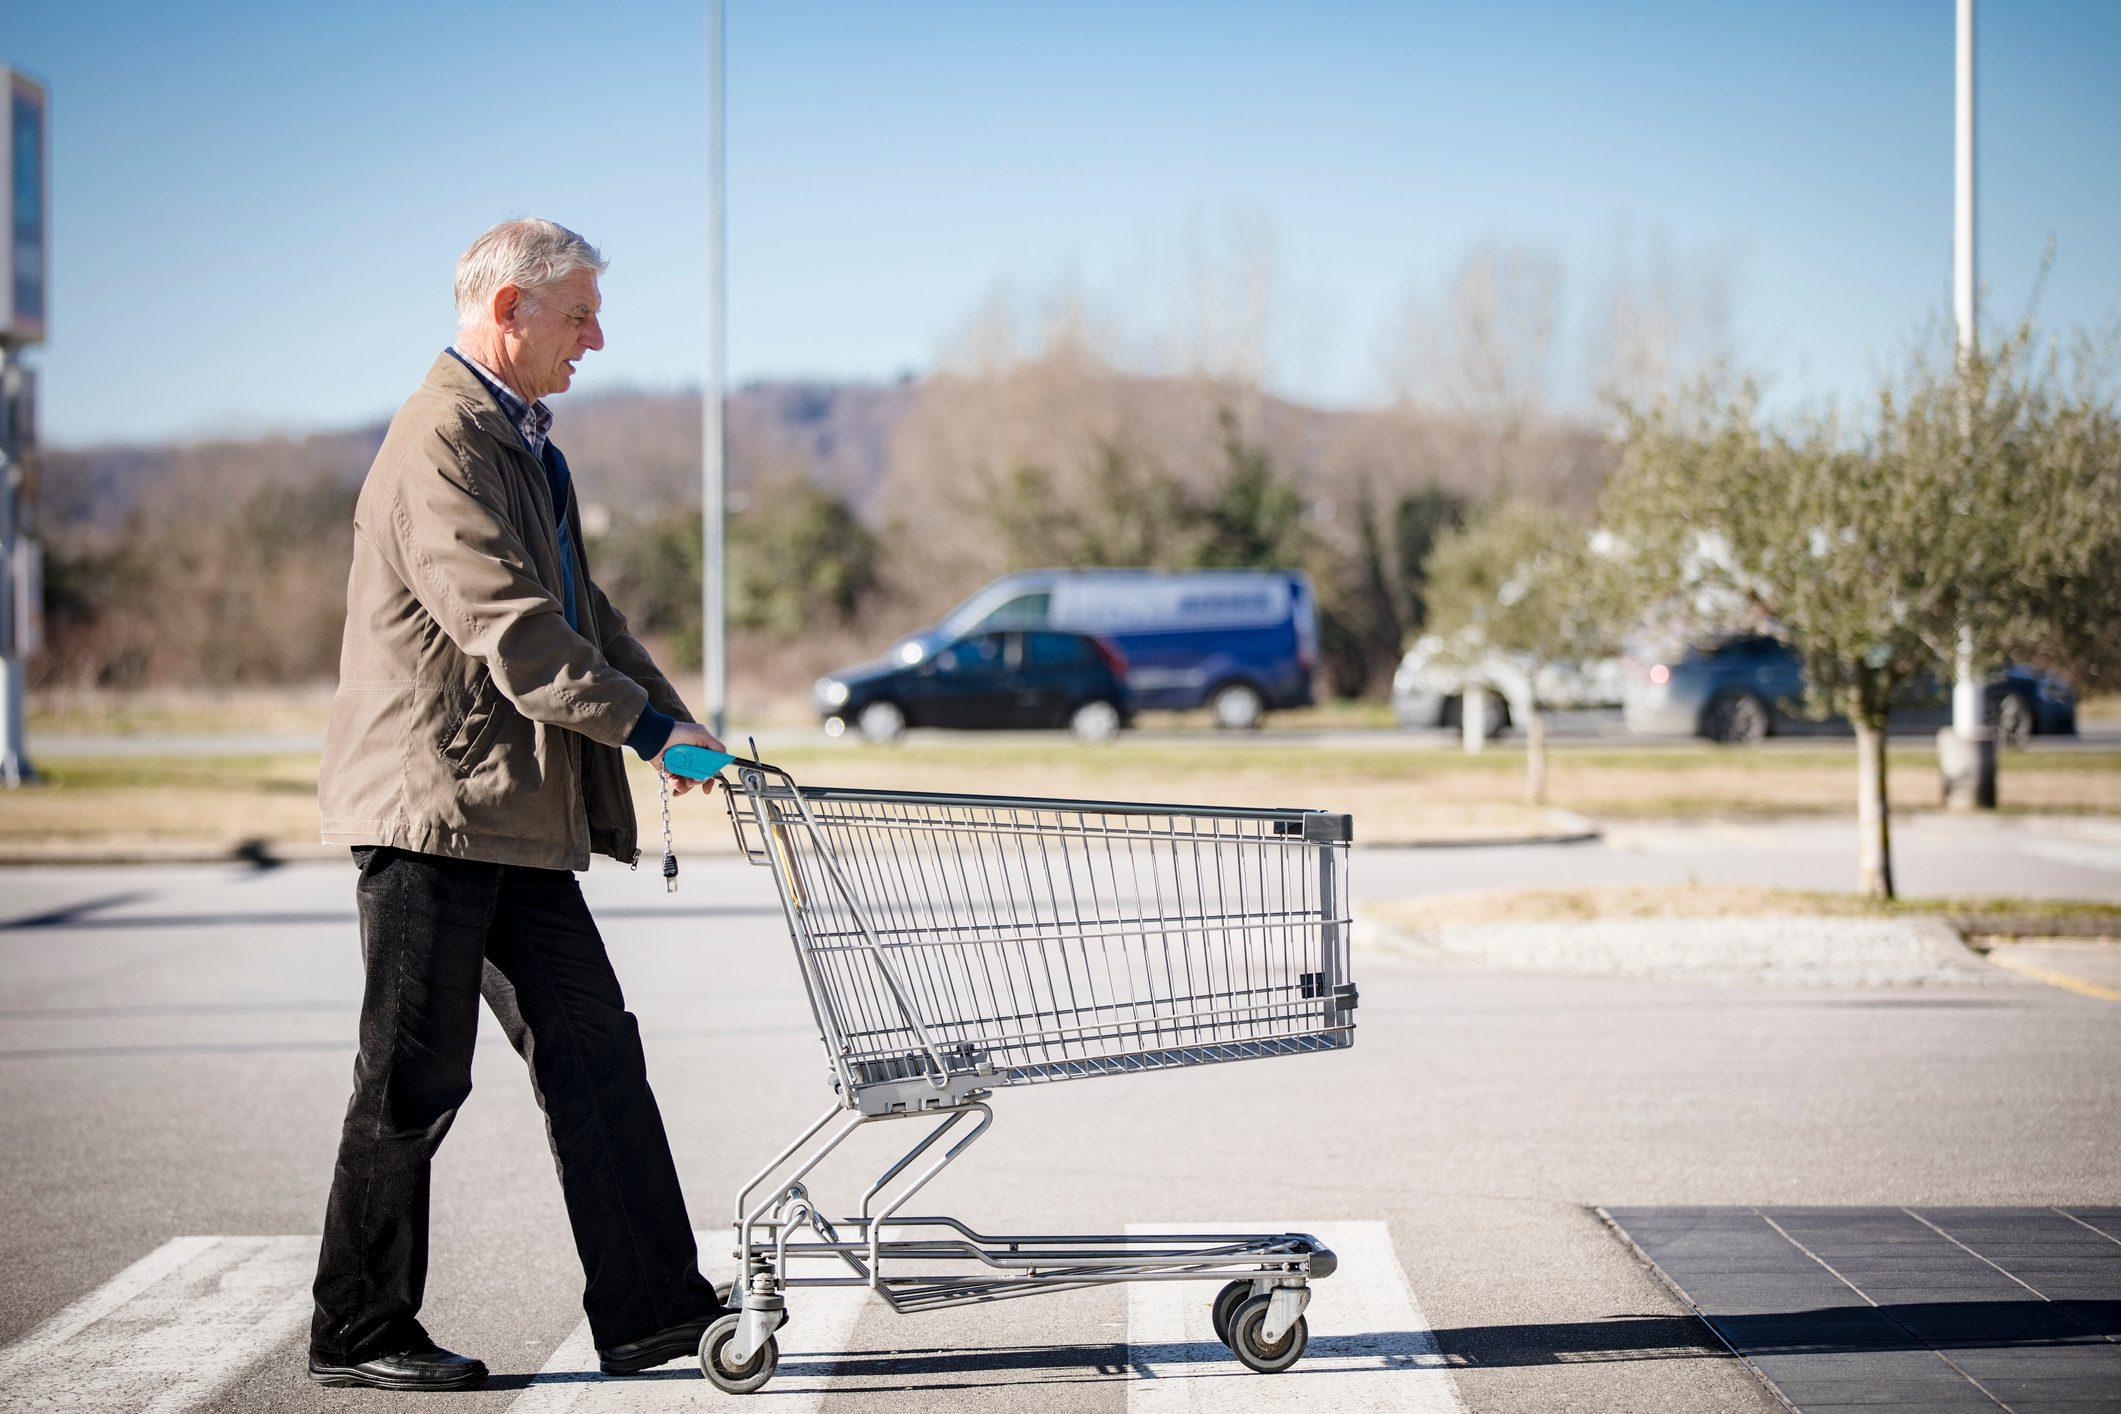 Senior Adult Man Pushing Empty Shopping Cart on Supermarket's Parking Lot